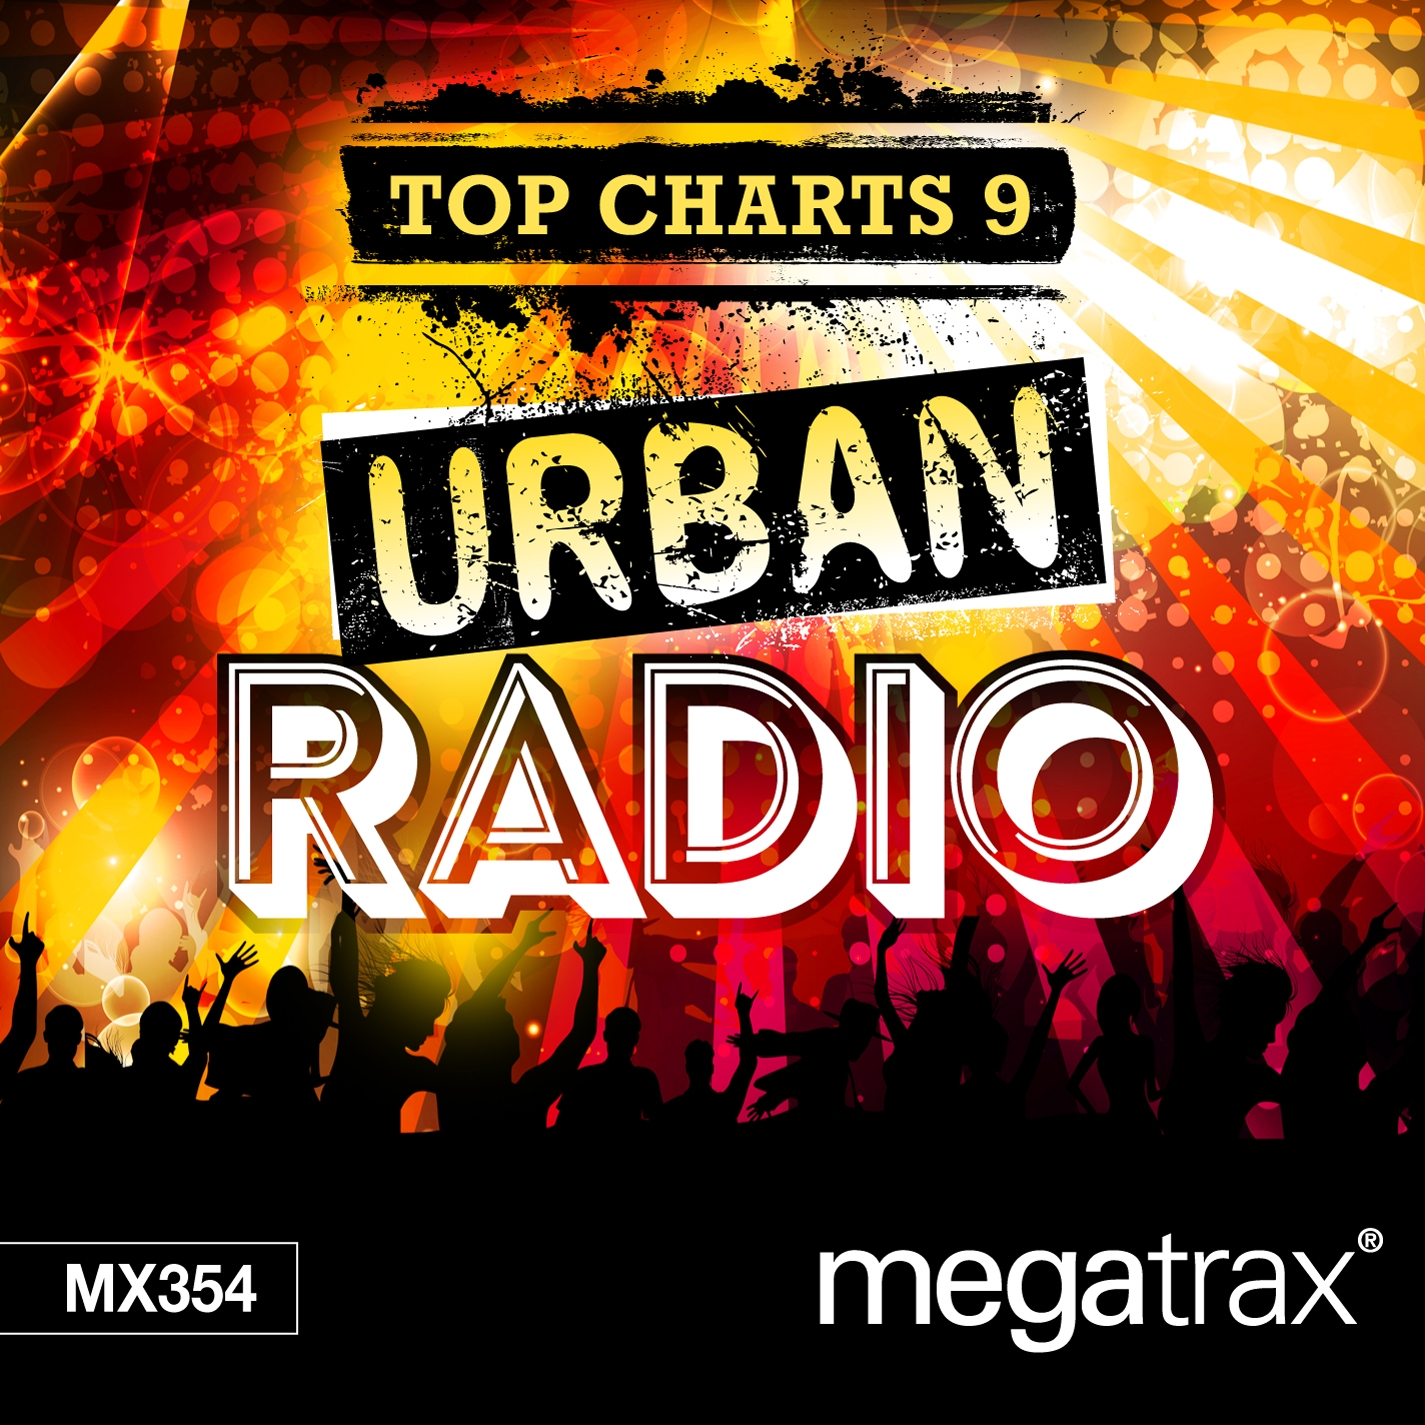 Top Charts 9: Urban Radio